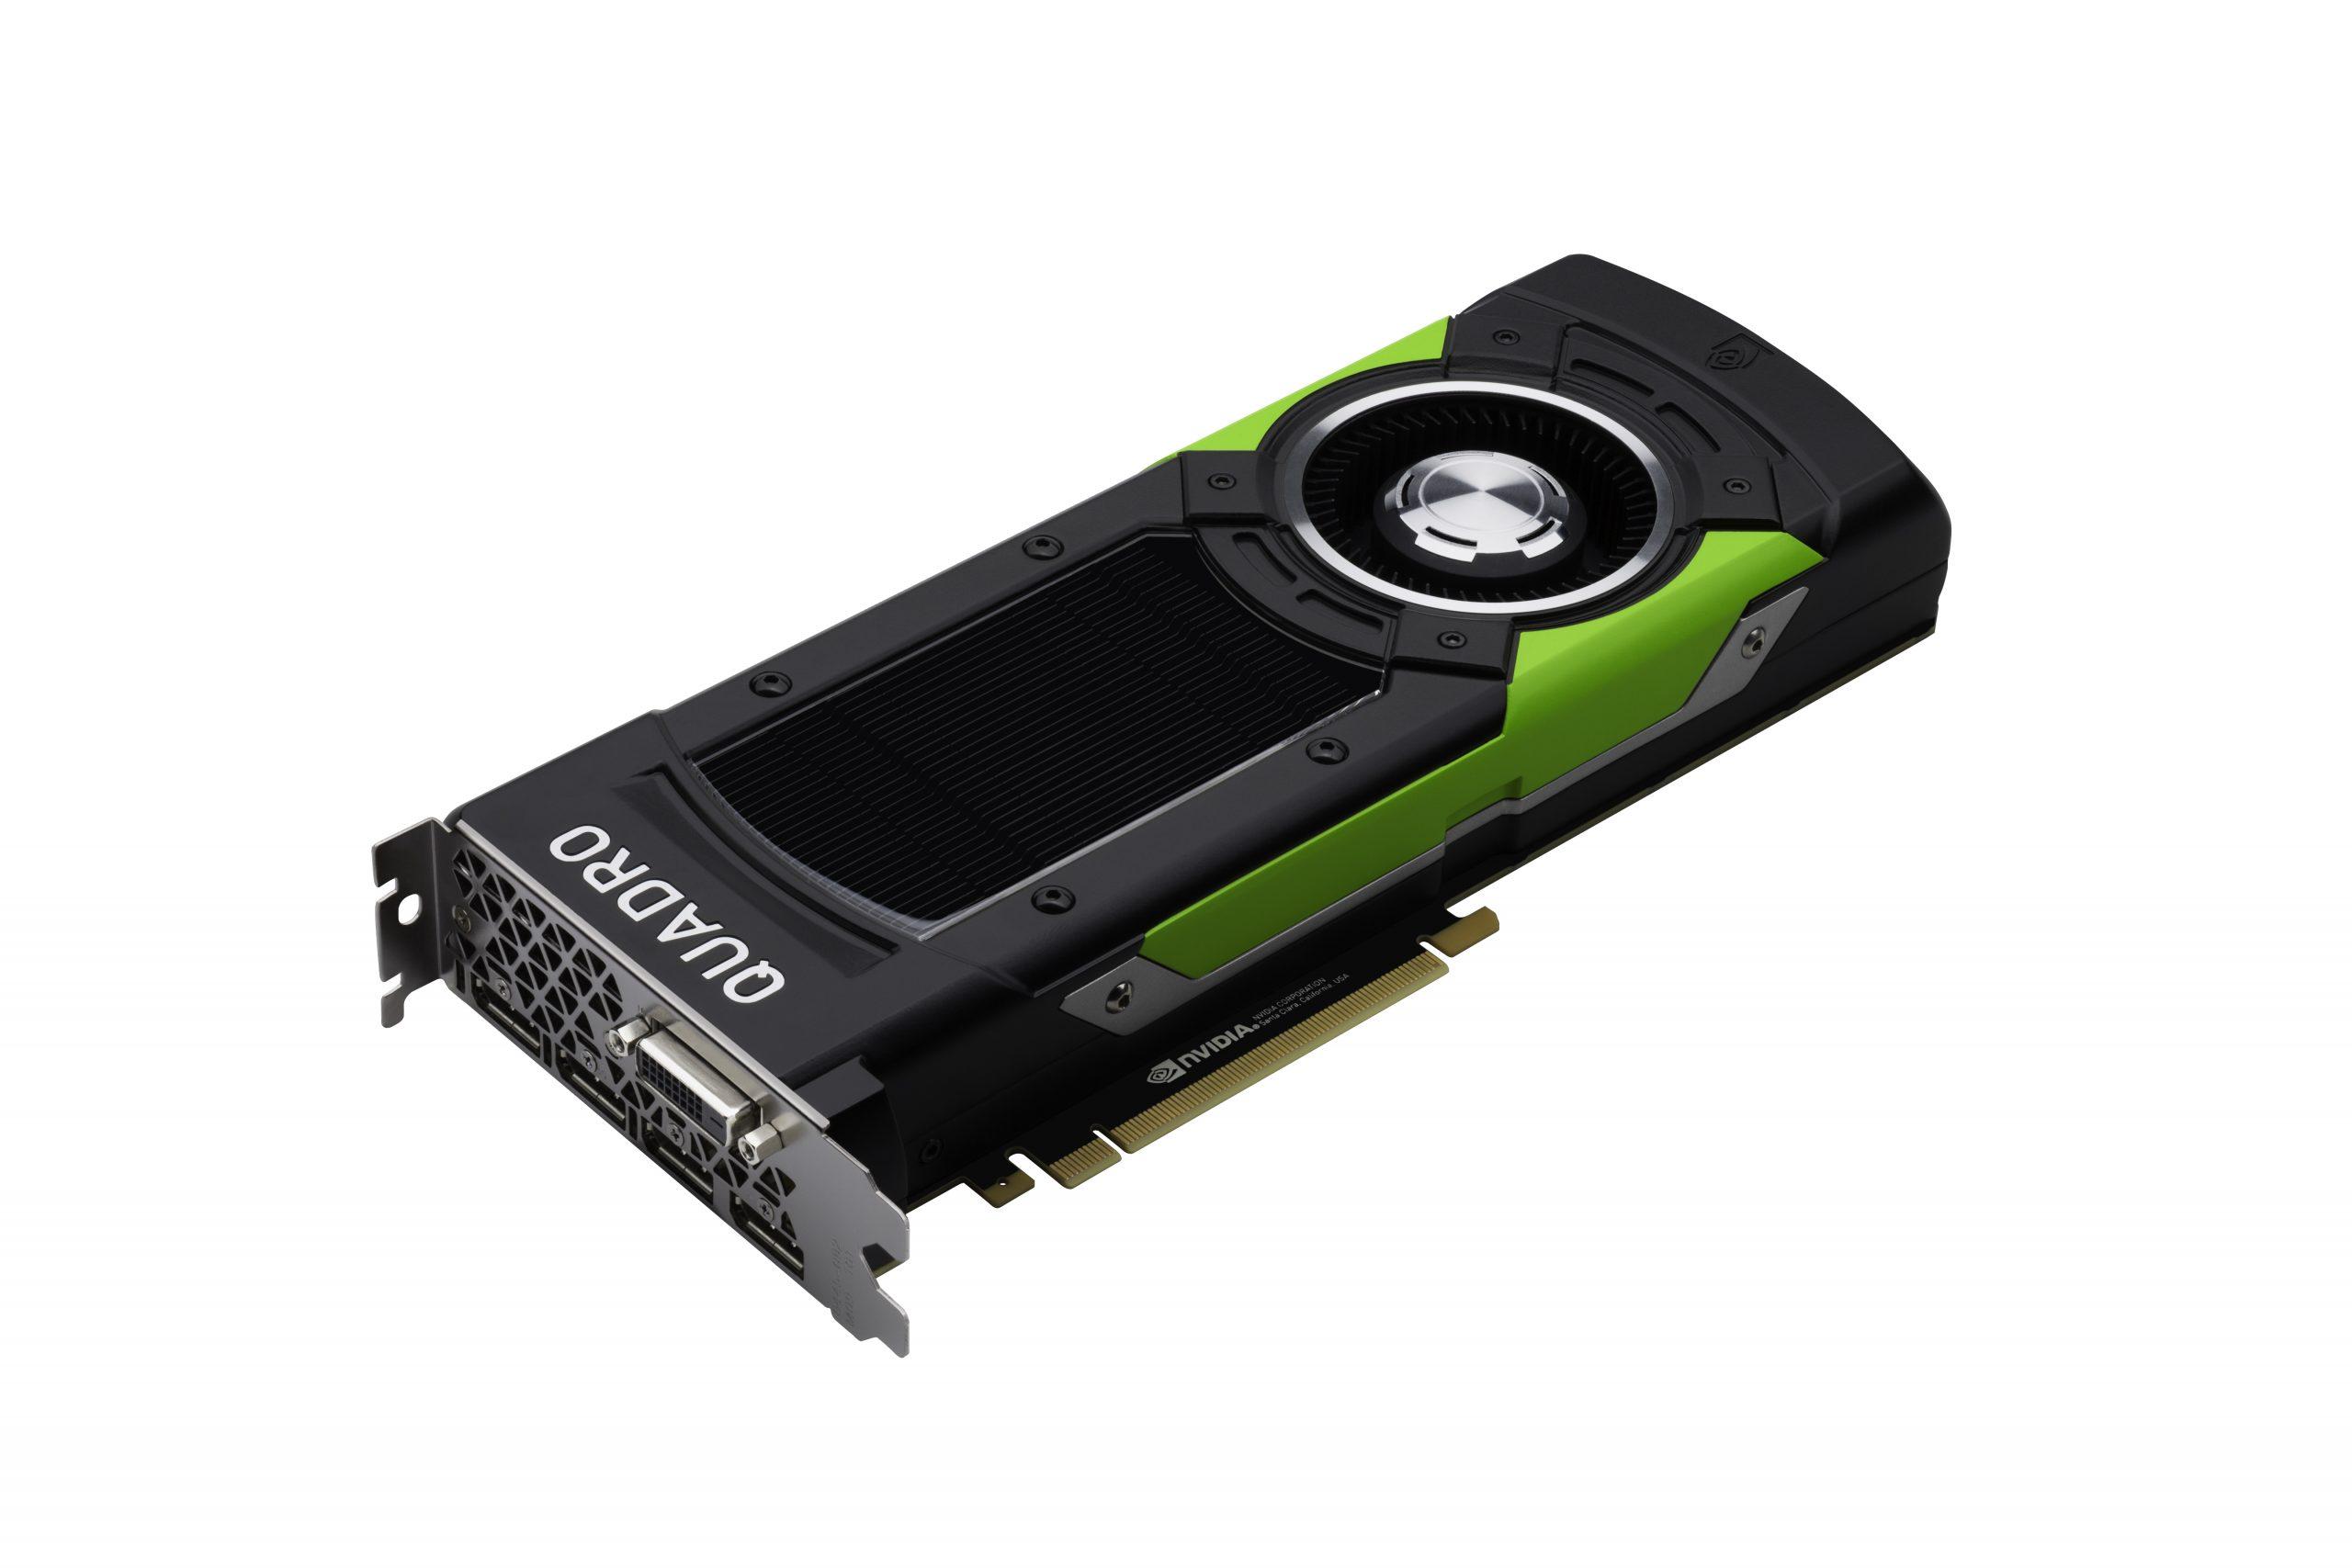 SIGGRAPH 2016 — NVIDIA Announces Pascal Quadro GPUs: Quadro P5000 and Quadro P6000